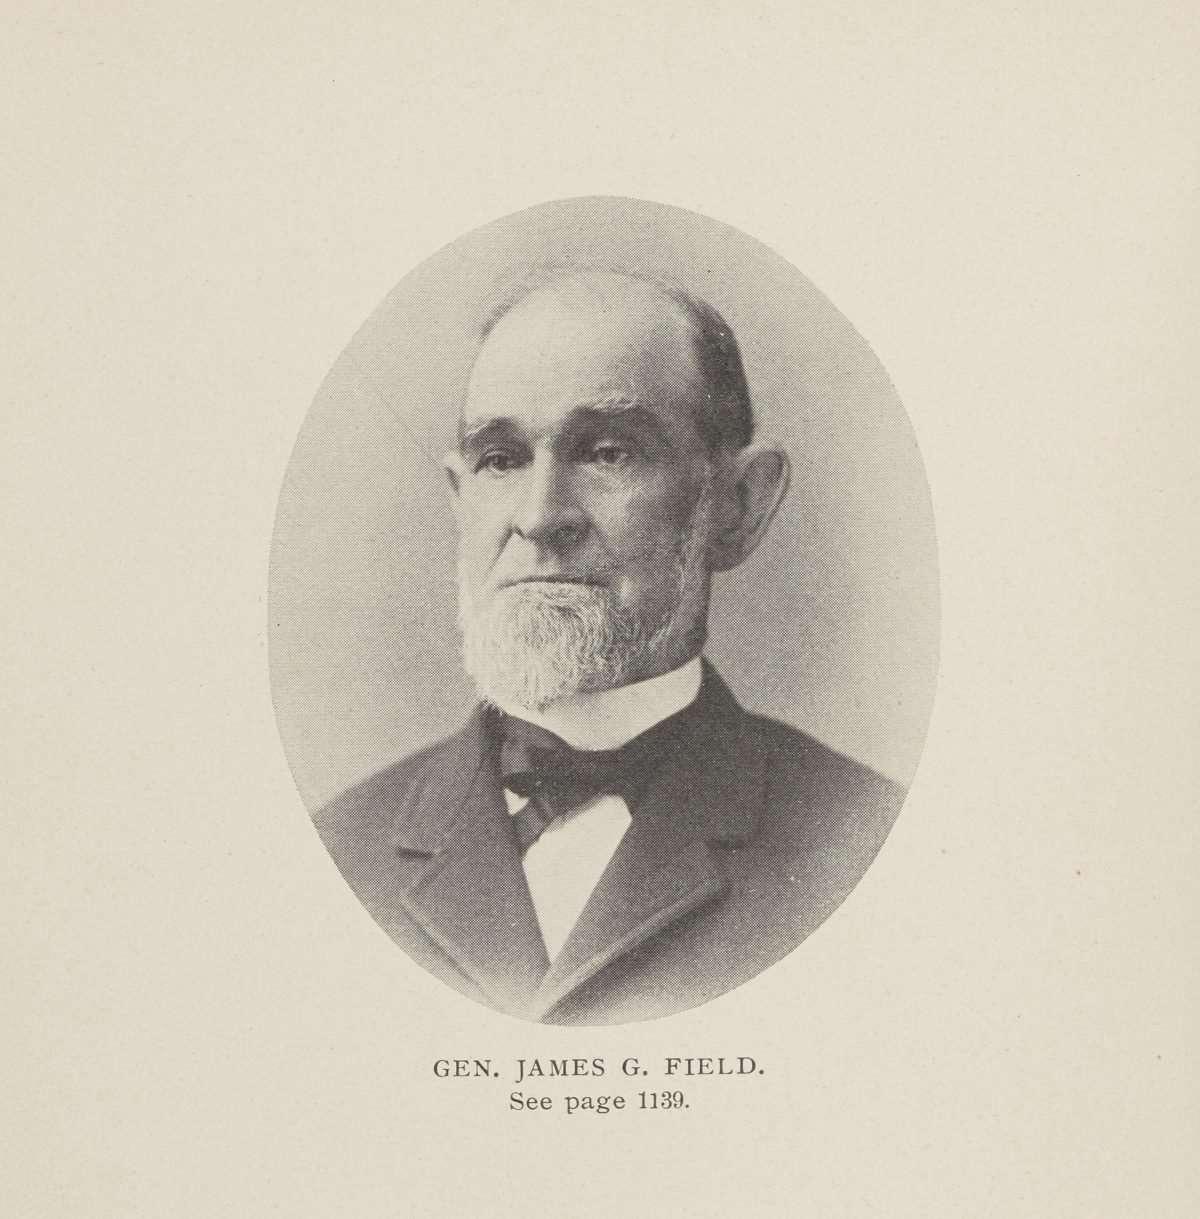 General James G. Field